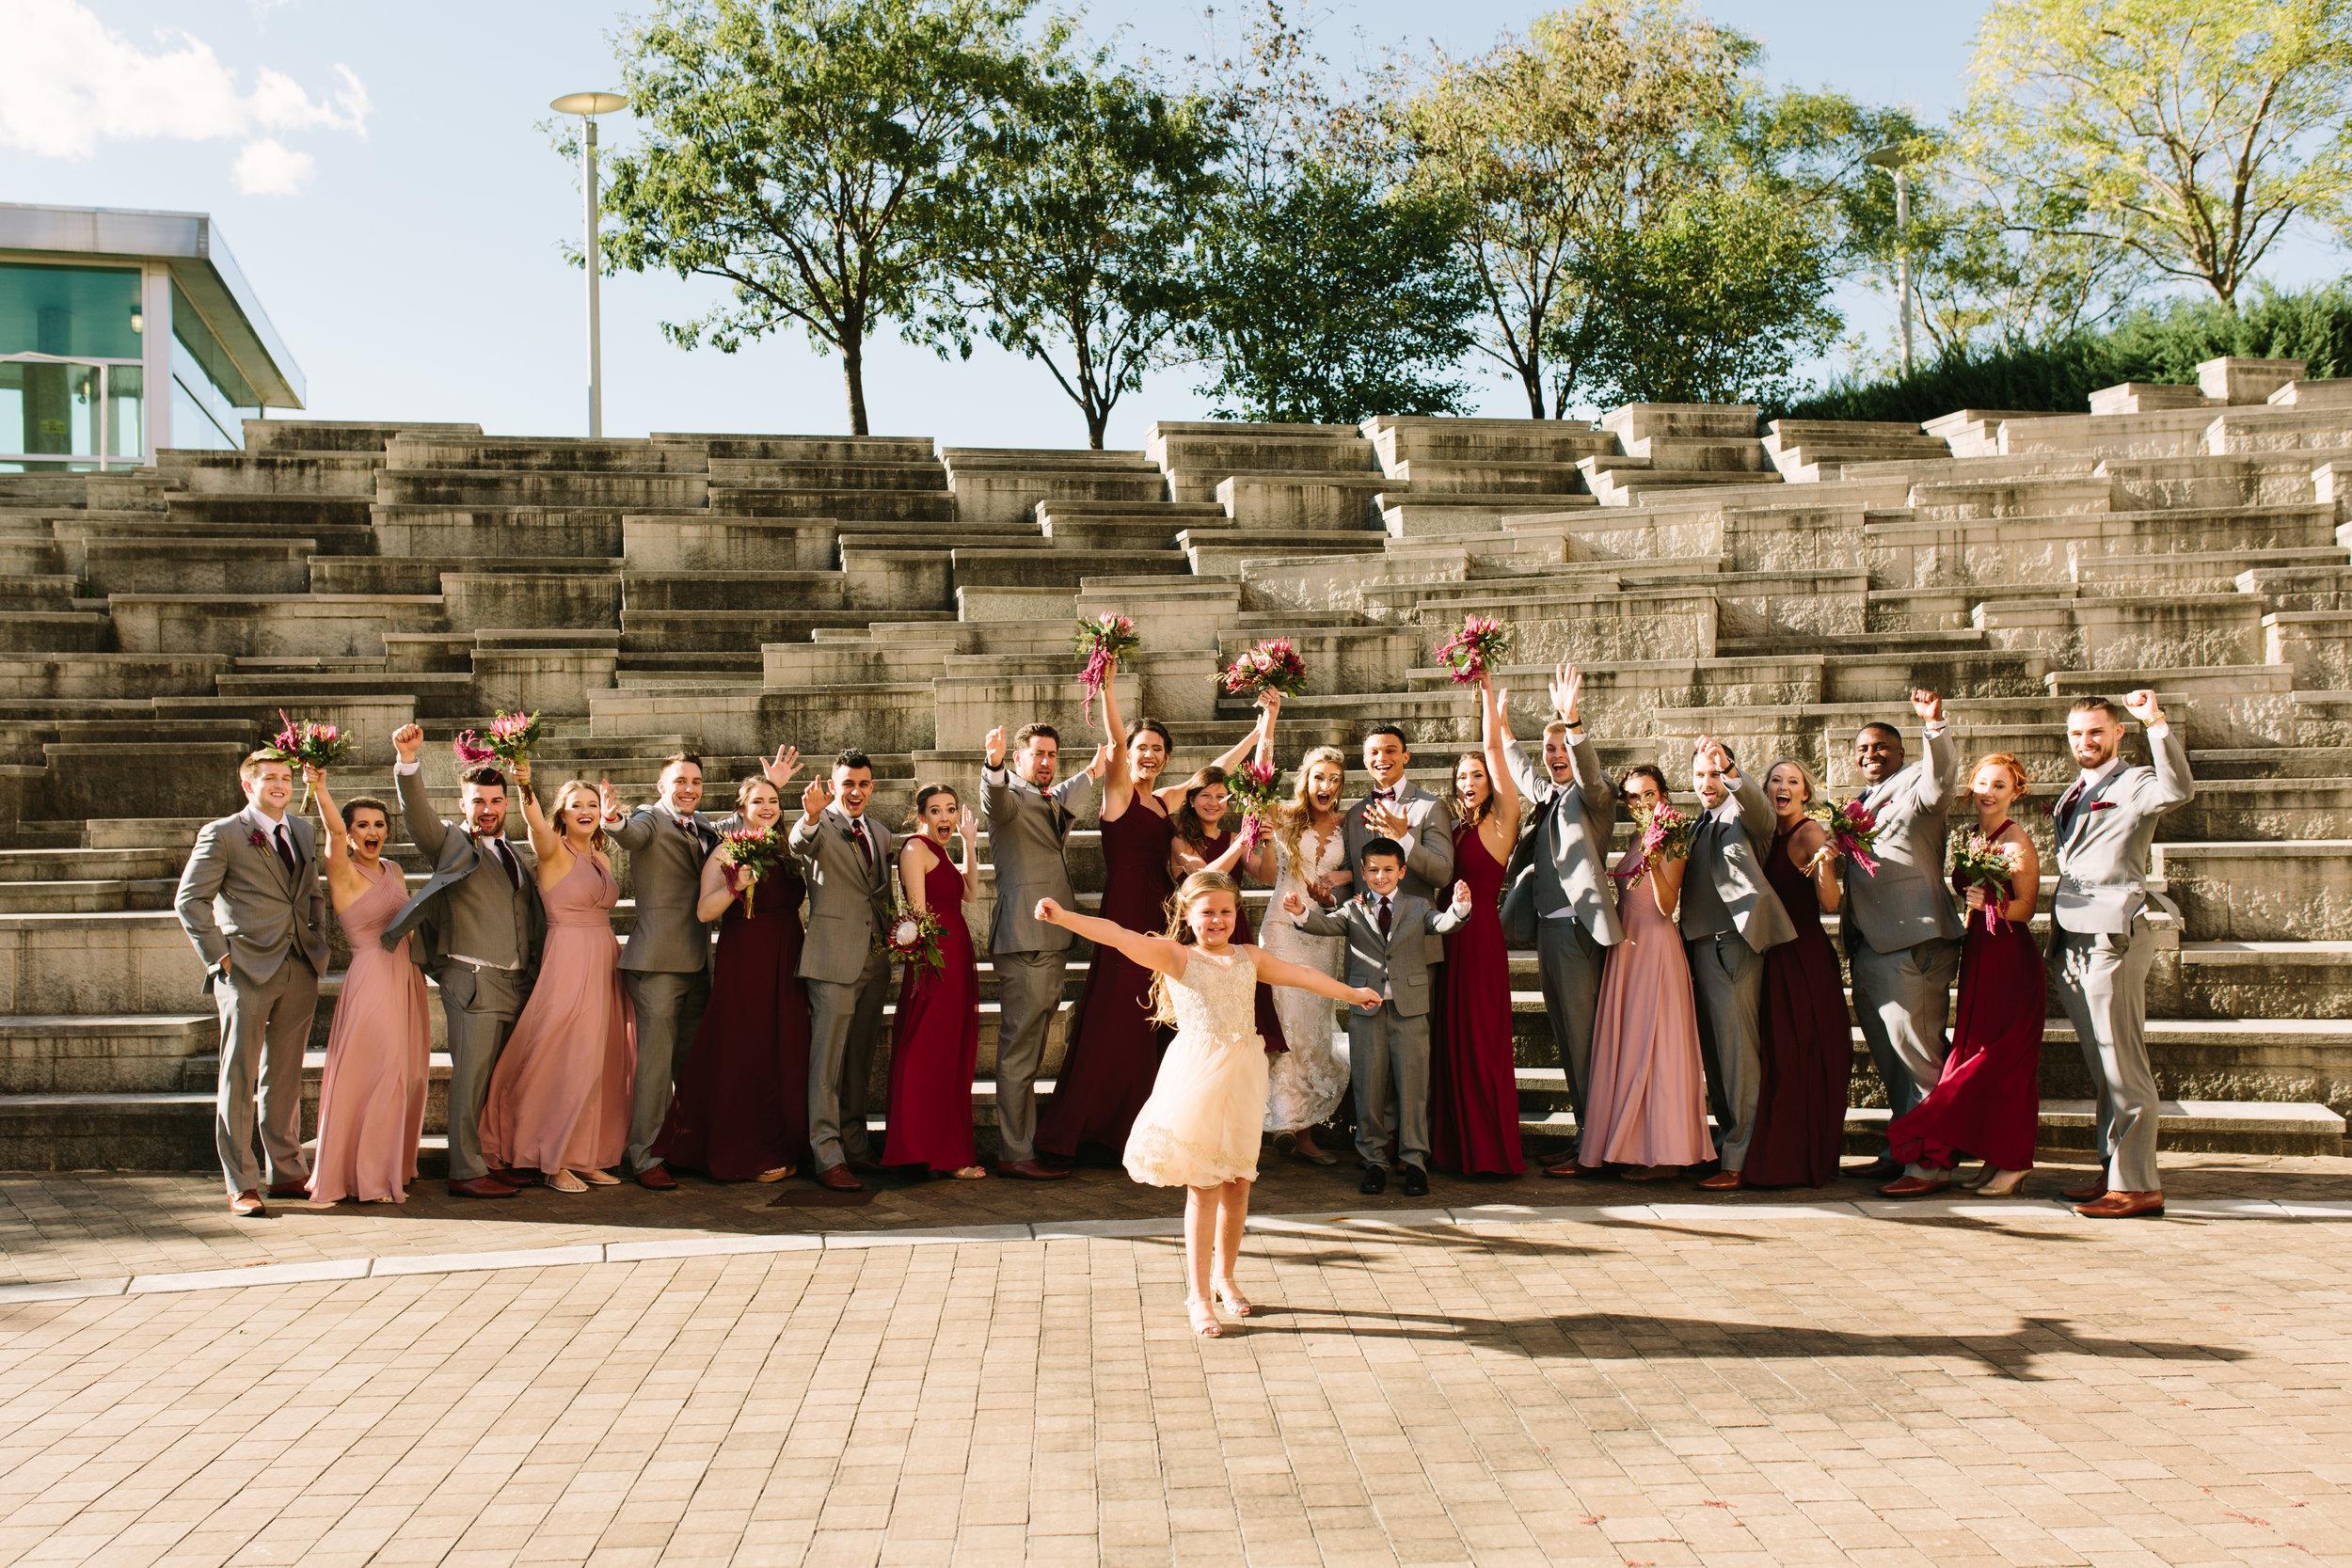 trent.and.kendra.photography.louisville.kentucky.wedding-35.jpg